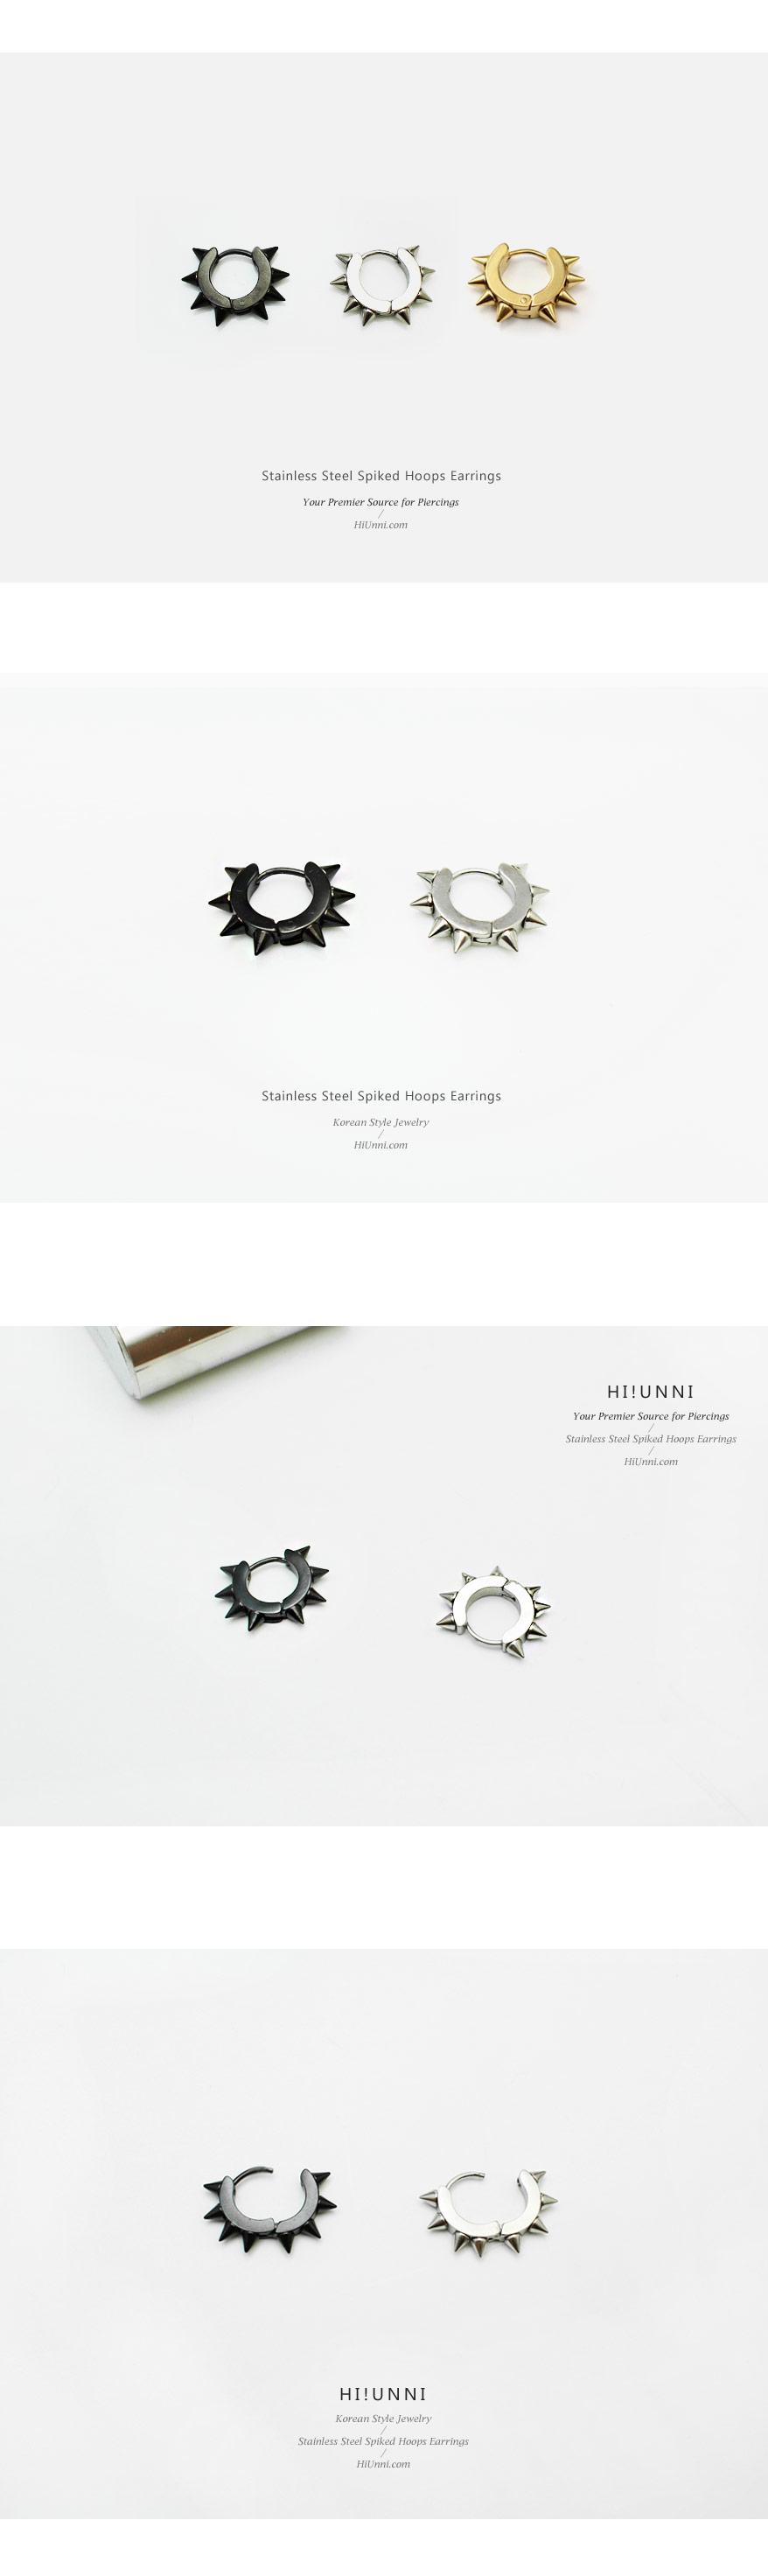 ear_studs_piercing_Cartilage_earrings_16g_316l_Surgical_Stainless_Steel_men_korean_asian_style_jewelry_hoops_spike_3